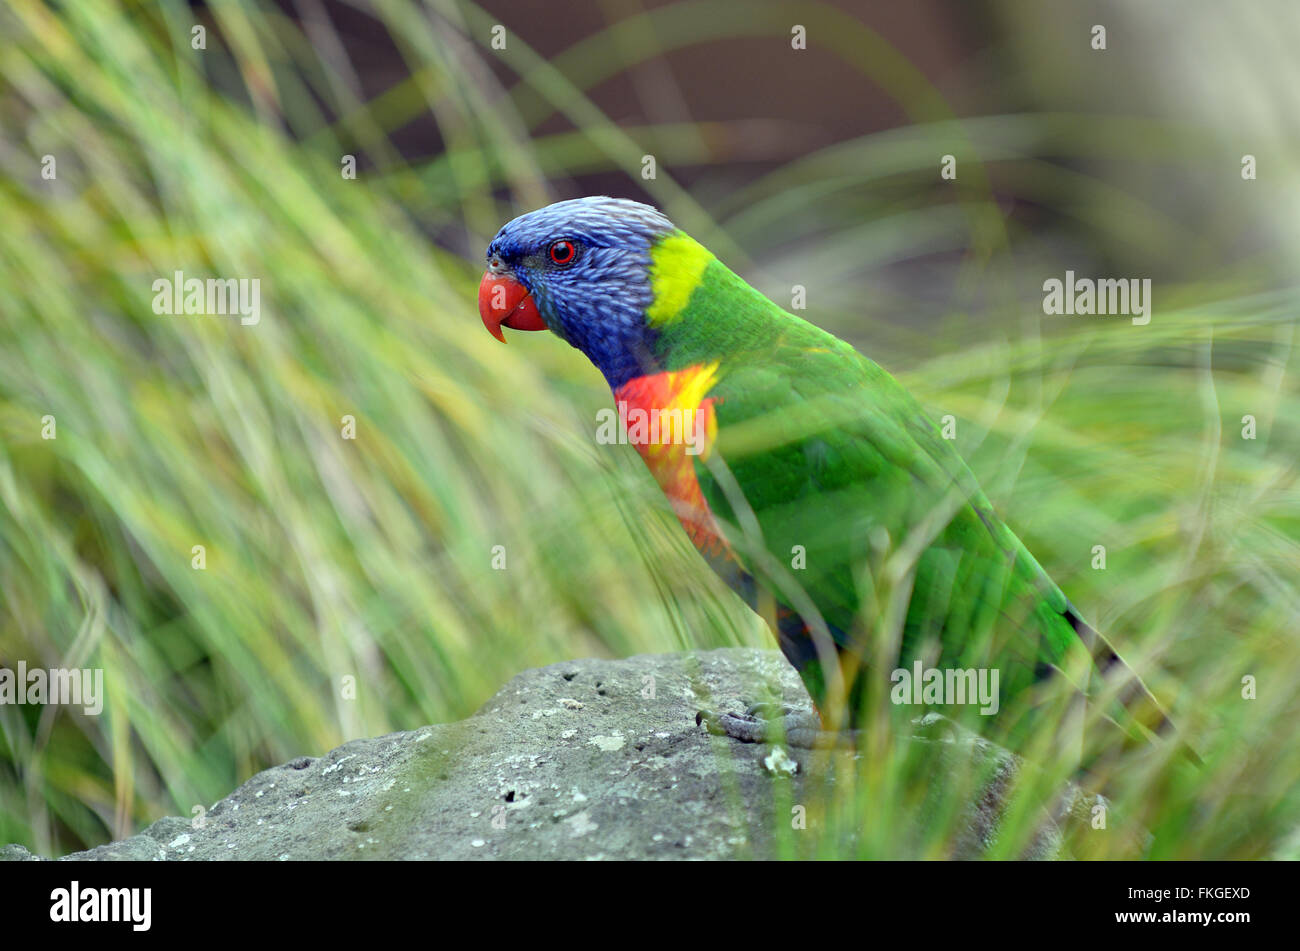 Rainbow lorikeet  (Trichoglossus moluccanus) is a species of parrot found in Australia. - Stock Image